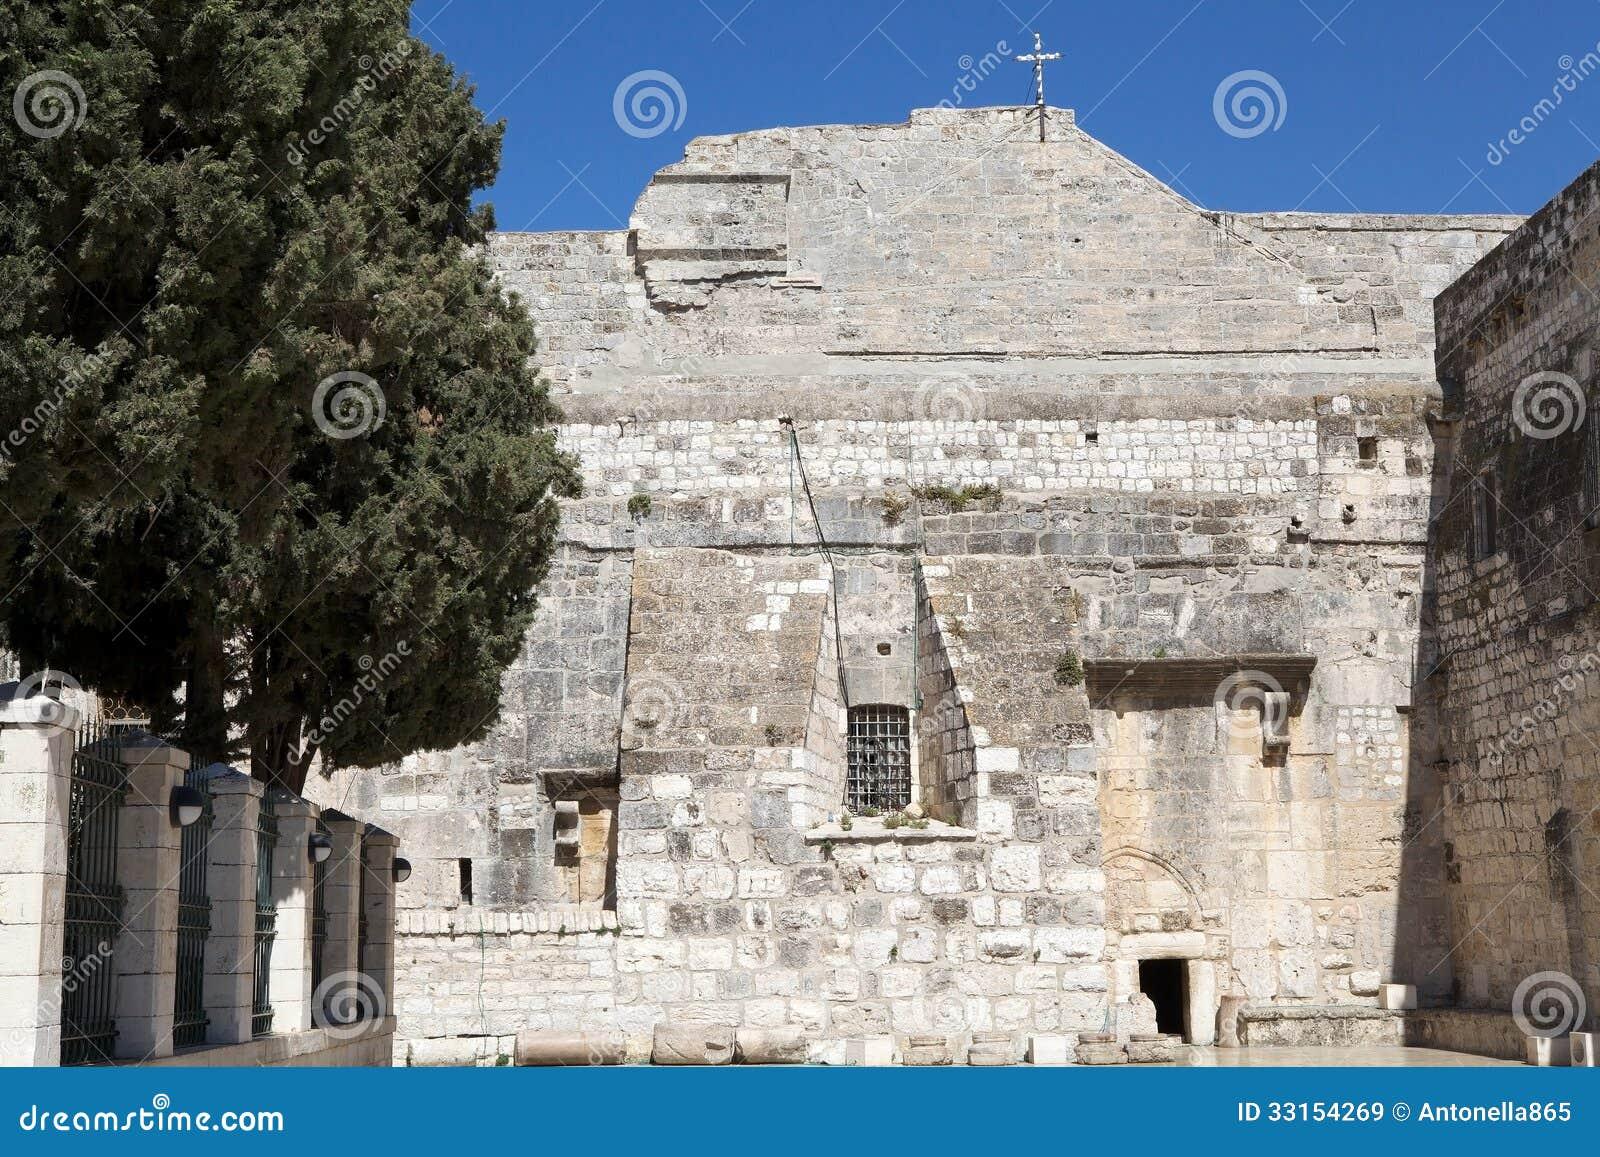 La iglesia de la natividad